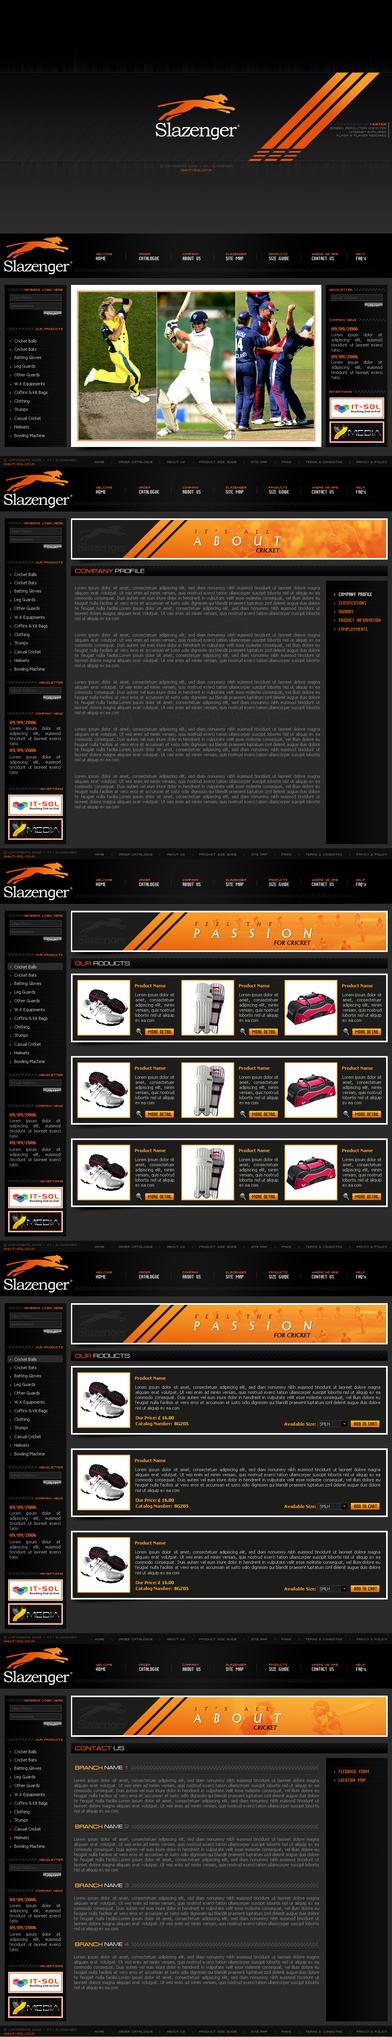 Slazenger by x-media by designerscouch